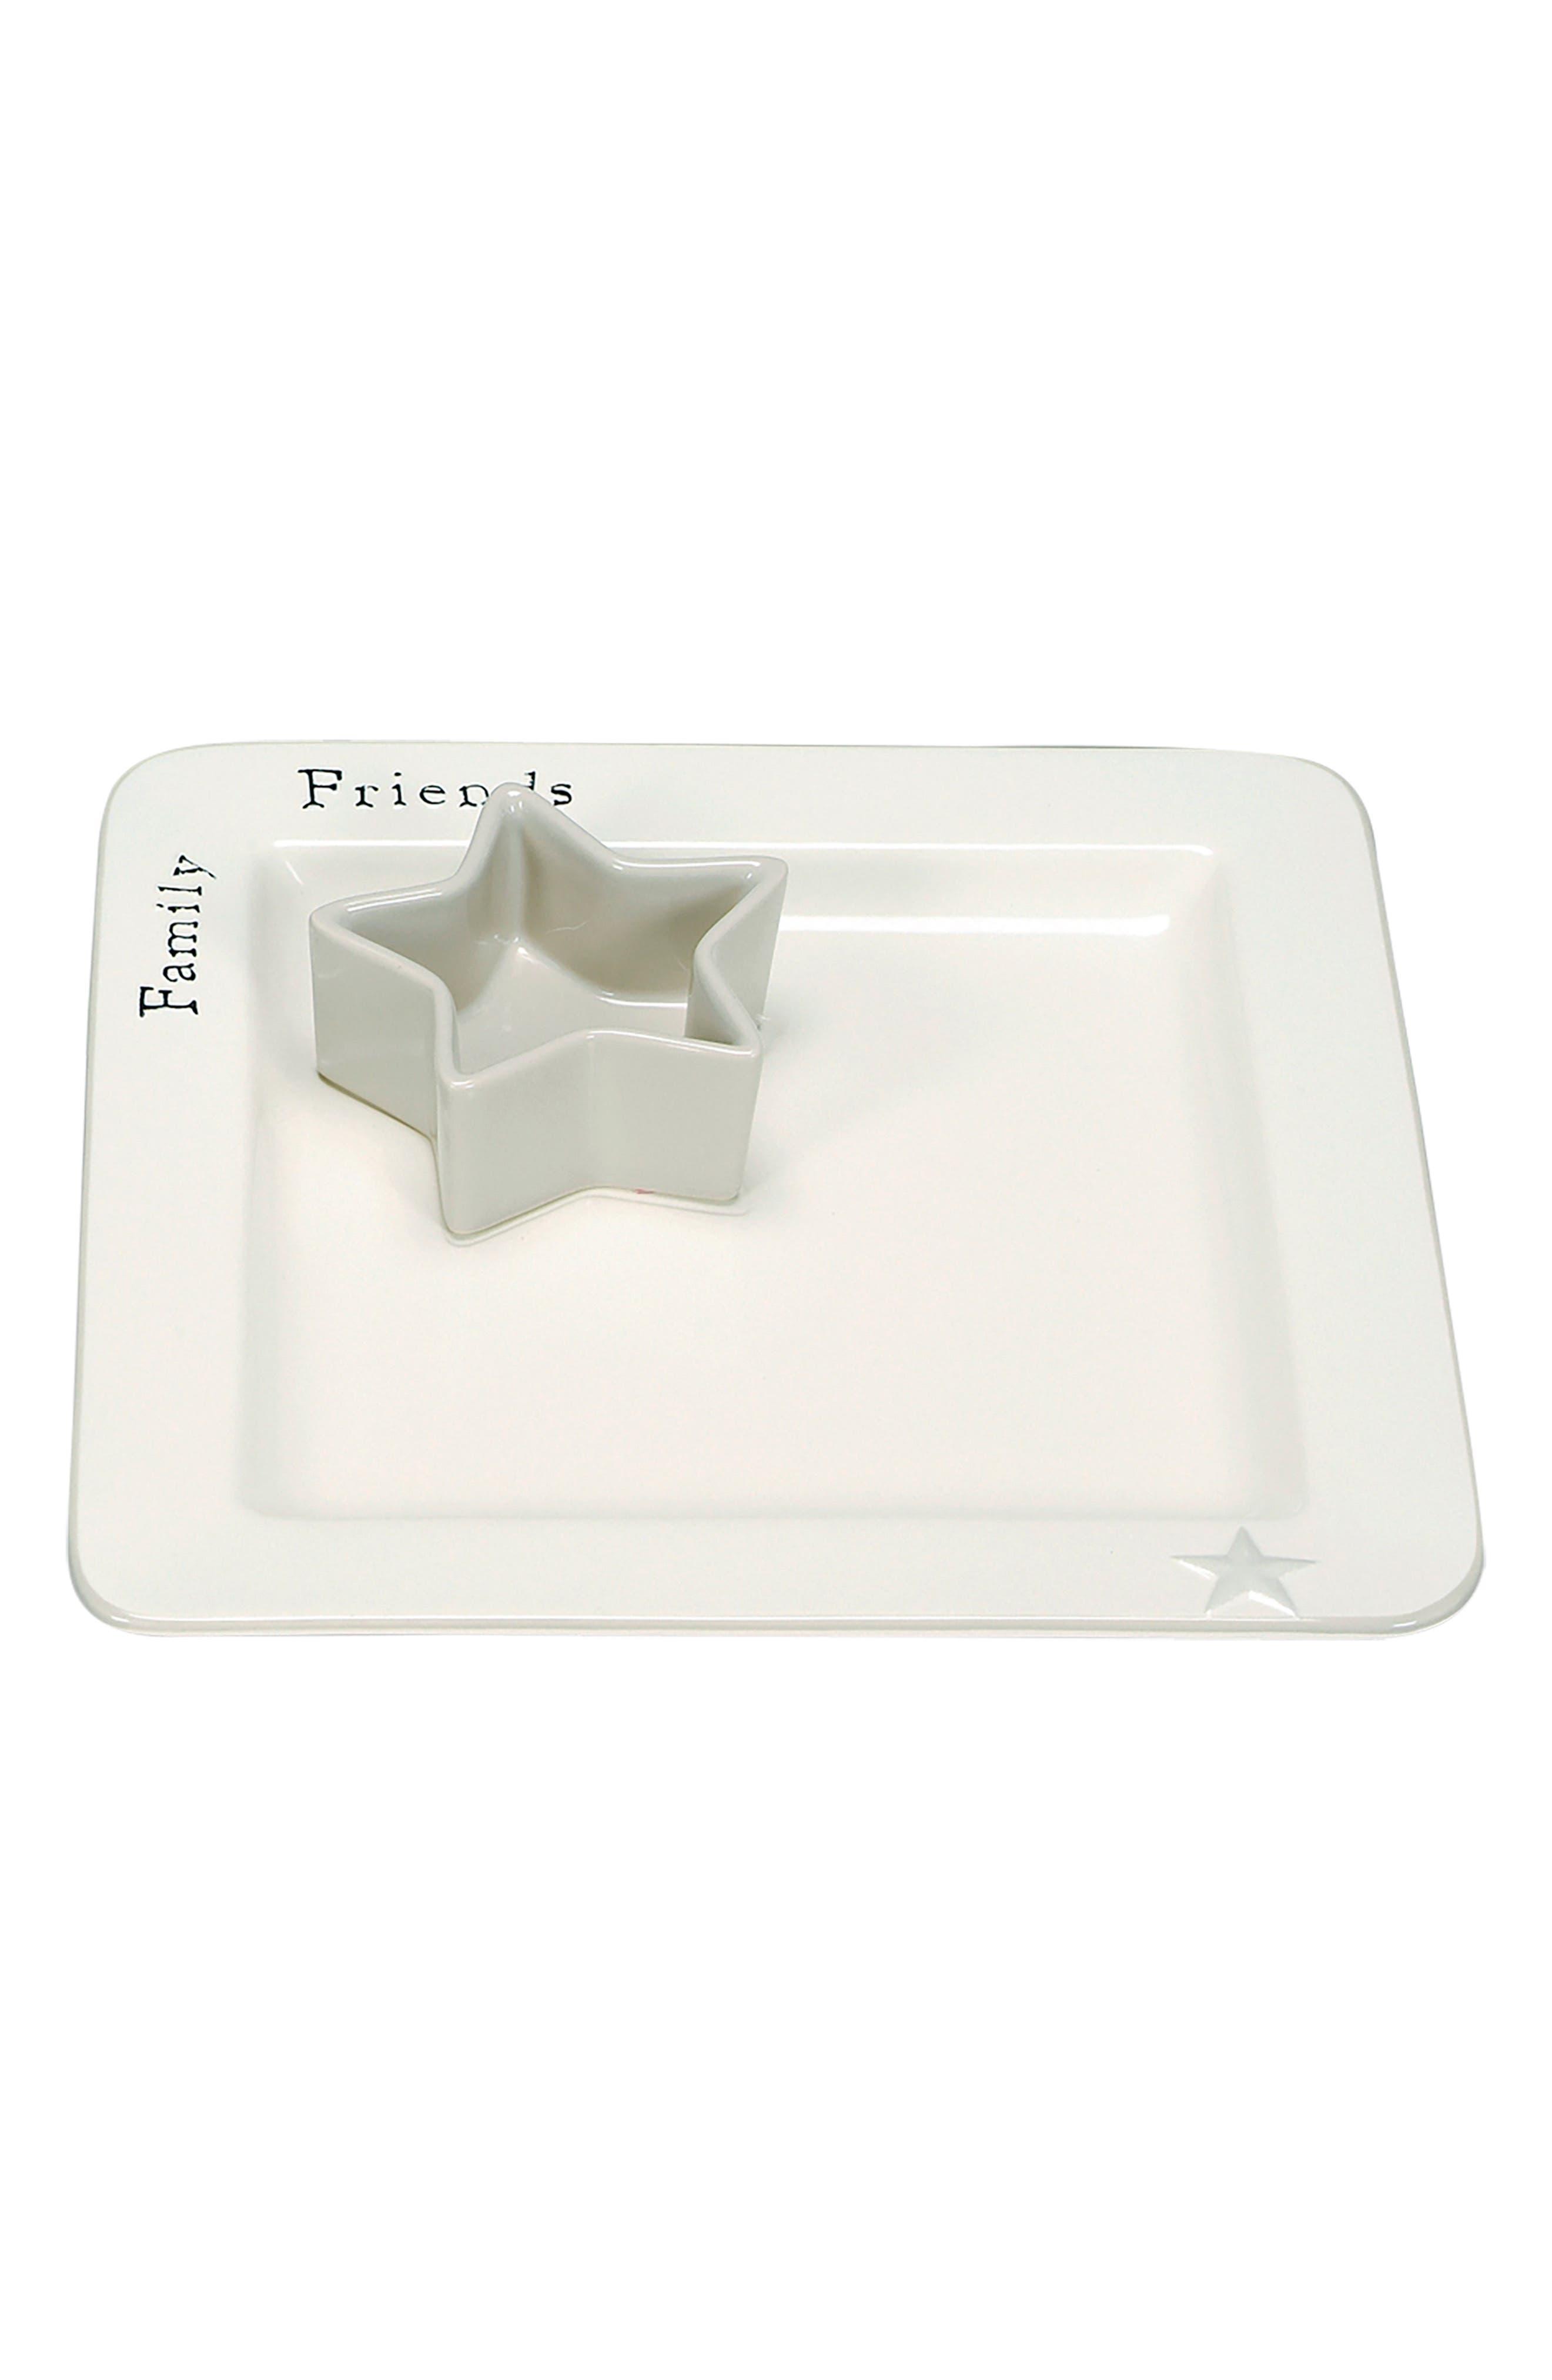 Primitives by Kathy Word Expressions Serving Platter & Bowl Set